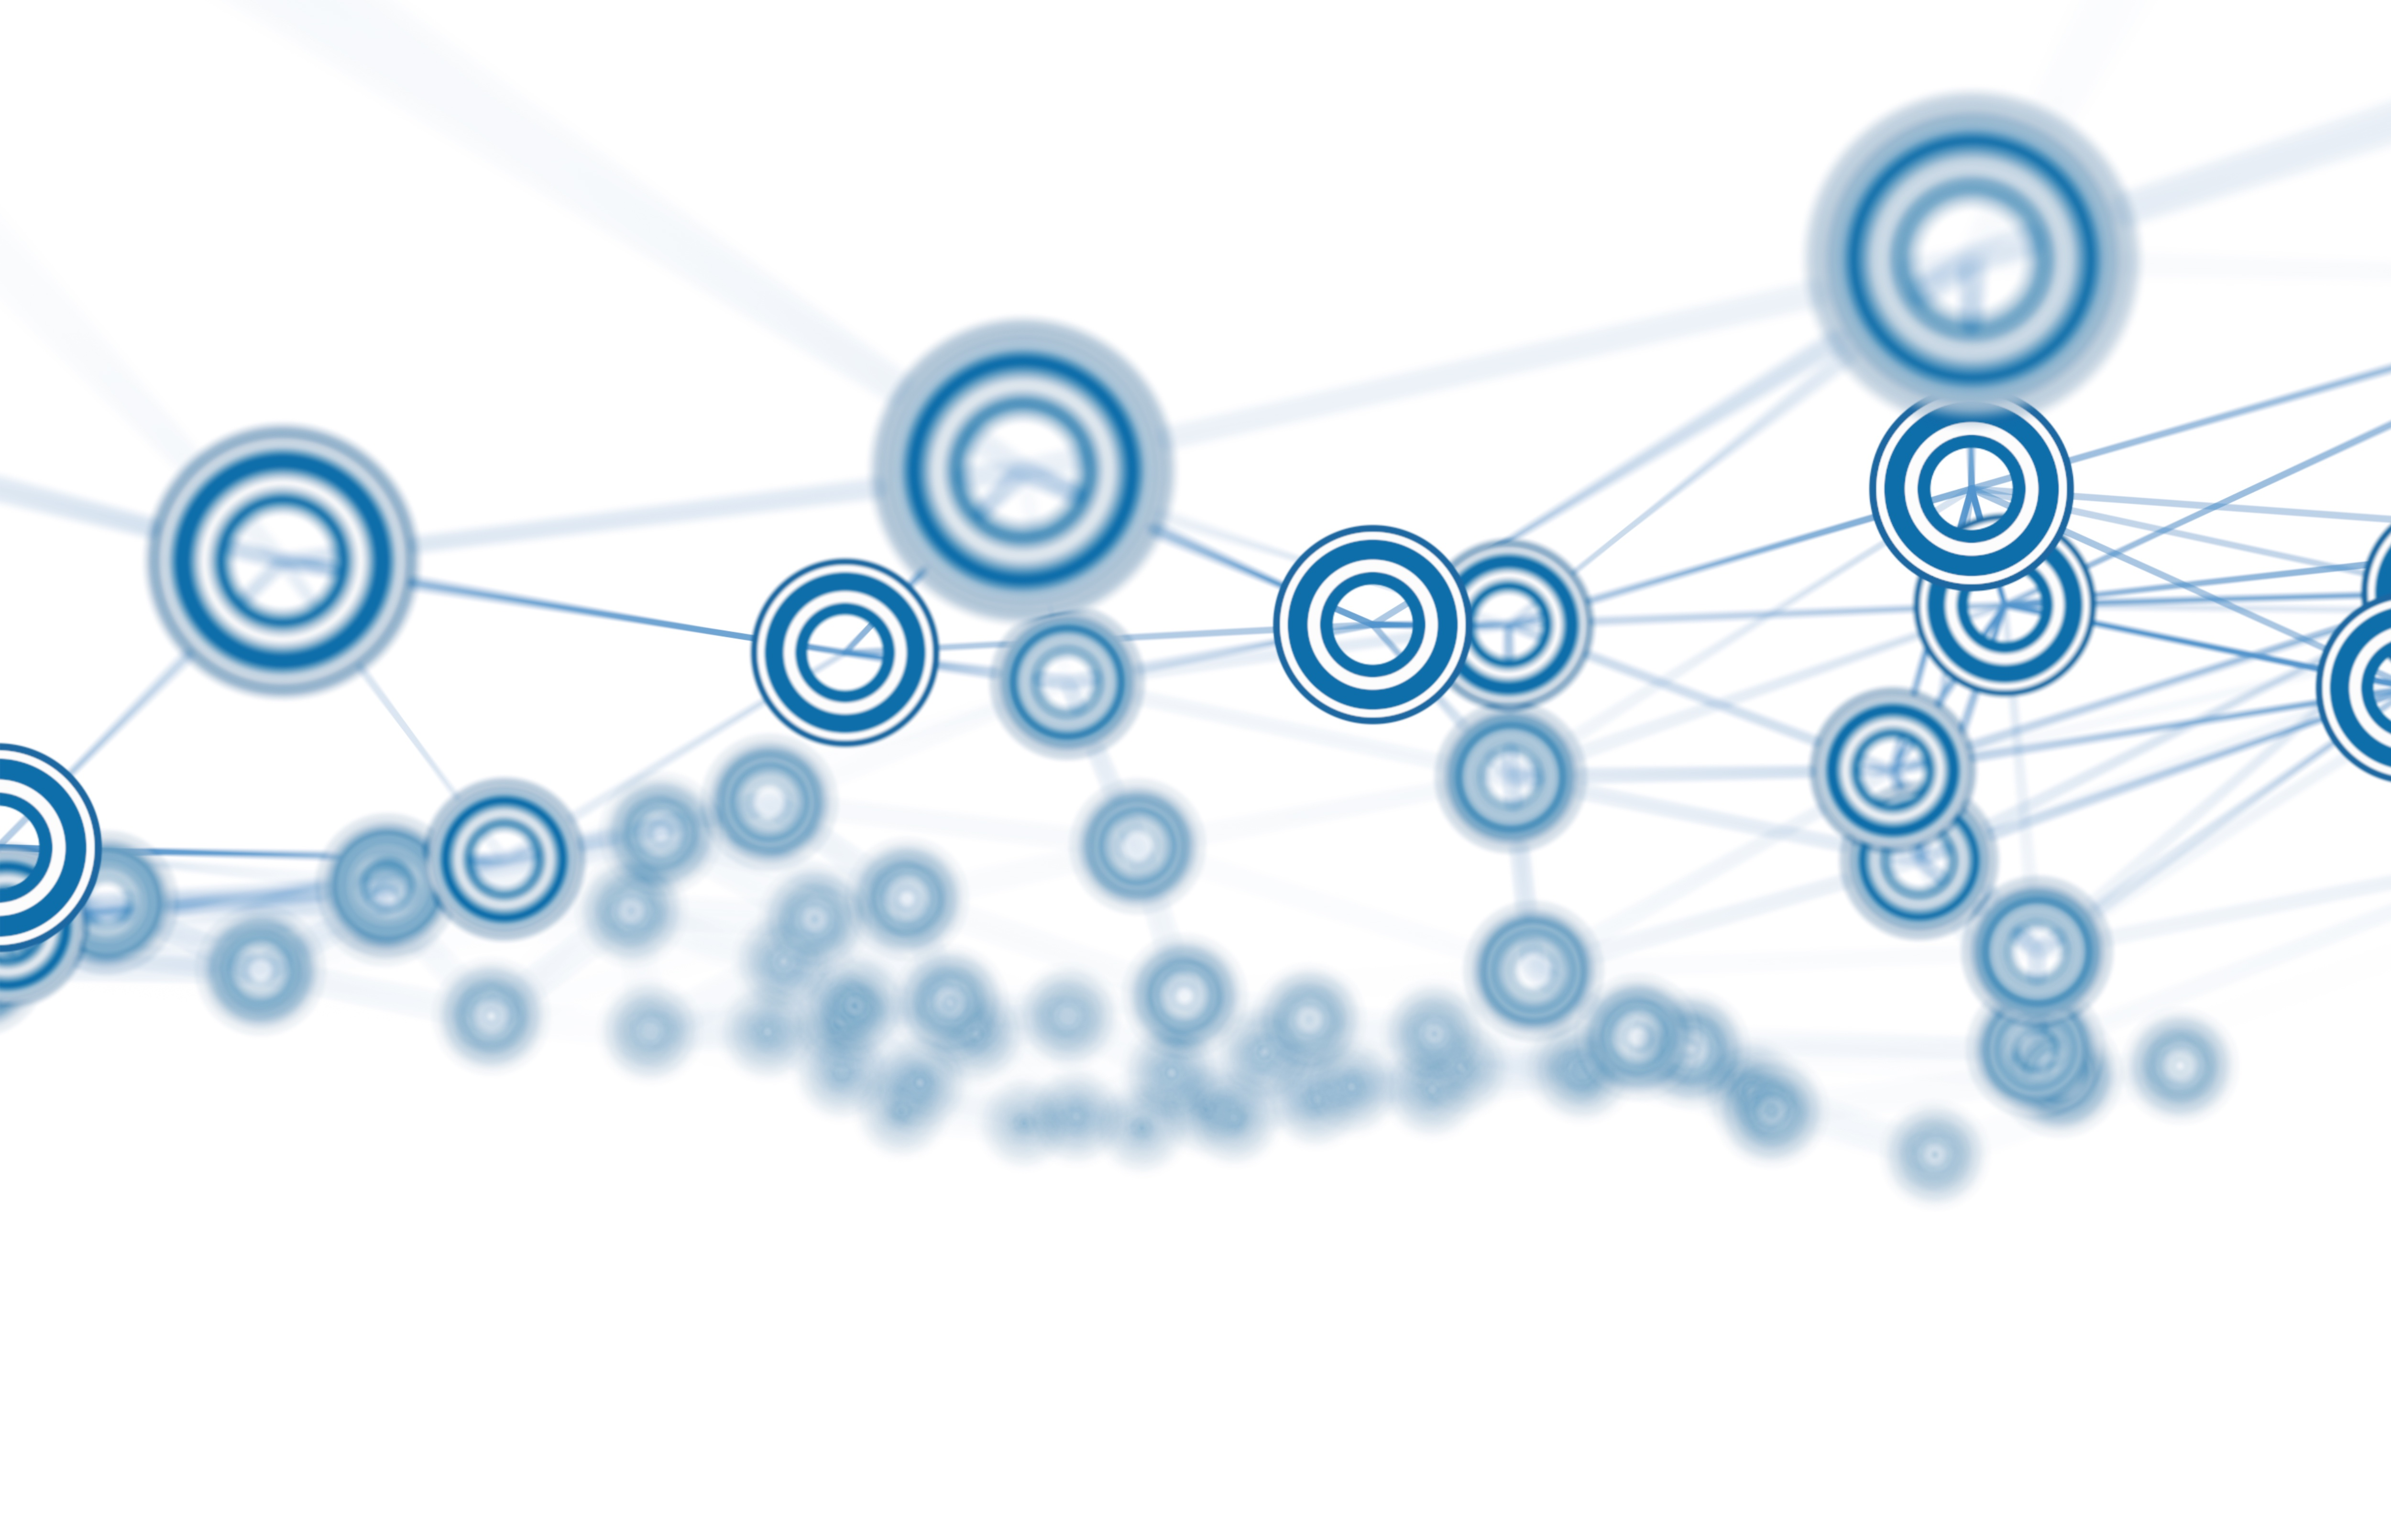 shutterstock network